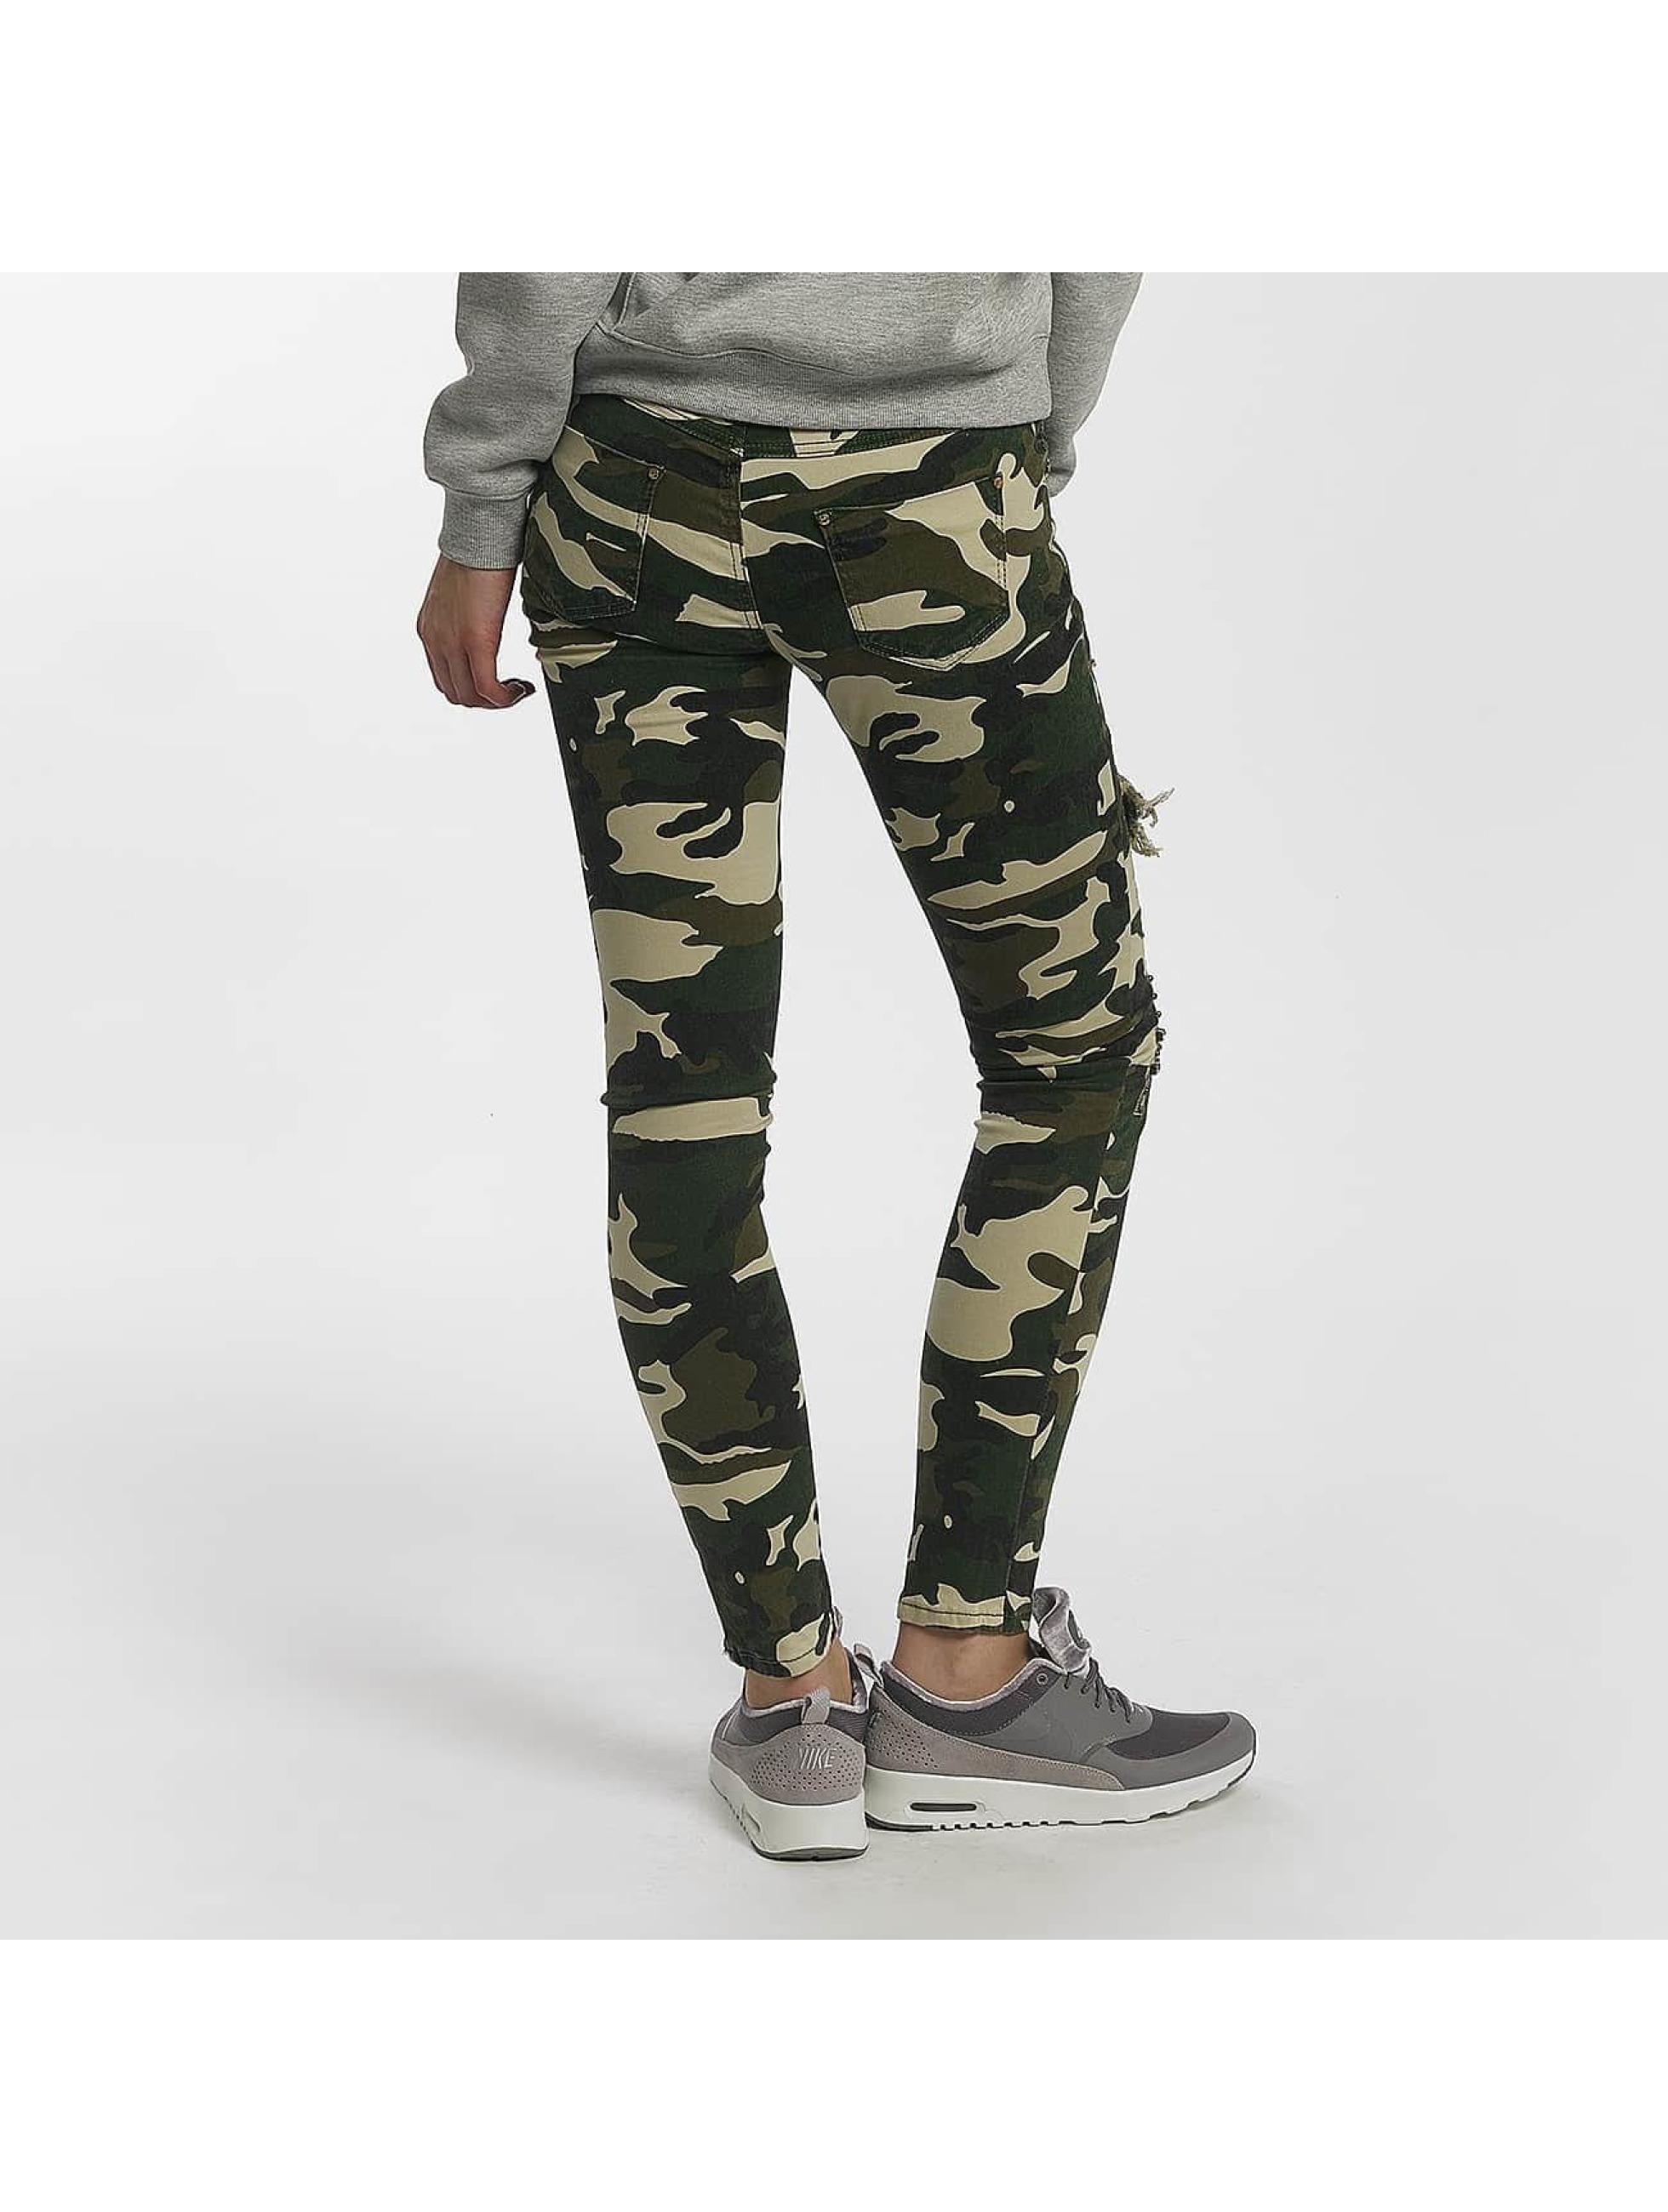 Leg Kings Jean skinny Deep Forest camouflage